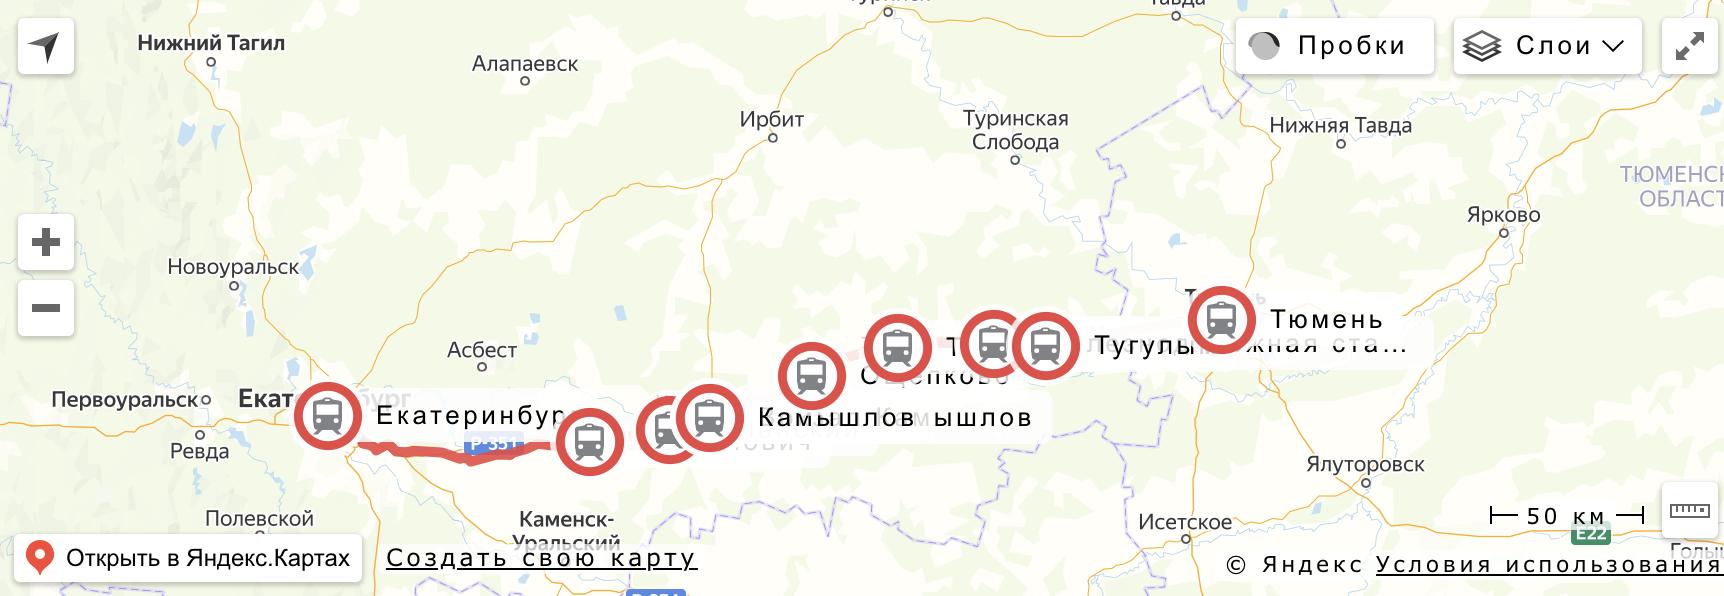 "Маршрут поезда ""Ласточка"" Тюмень - Екатеринбург"